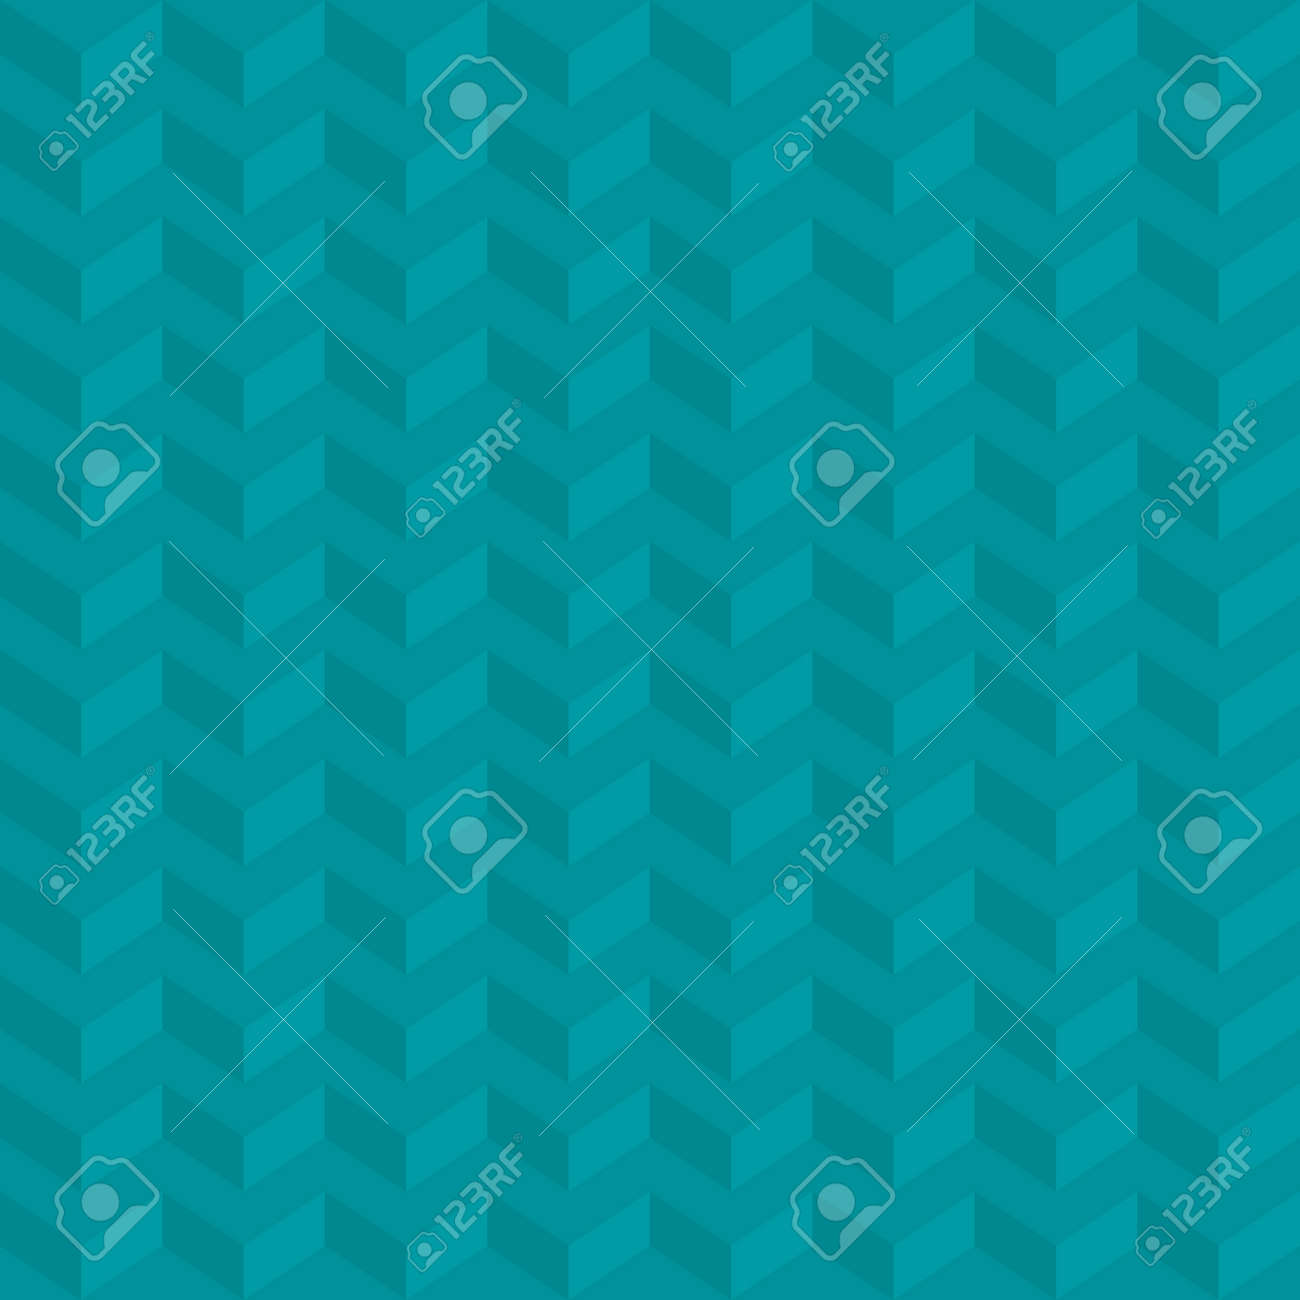 Turquesa Isométrica Patrón De Chevron Neutral Seamless Herringbone Wallpaper Pattern For Modern Design In Flat Style Tileable Geometric Tech Vector